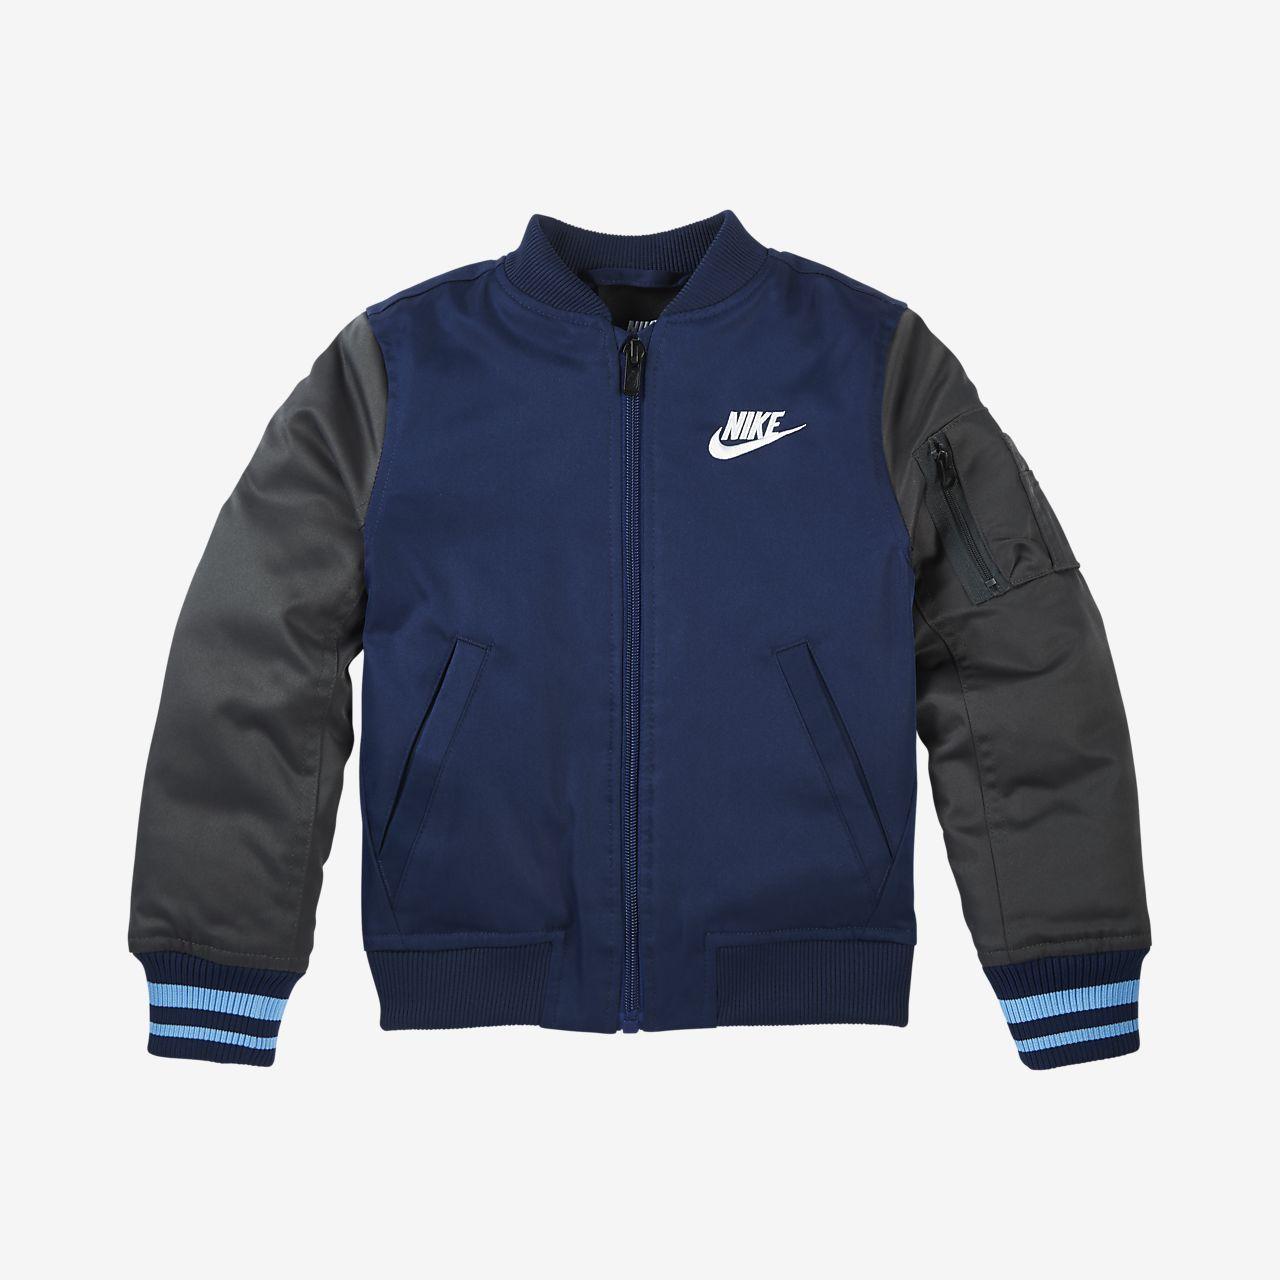 9f603a4f9 Nike Sportswear Varsity Toddler Bomber Jacket